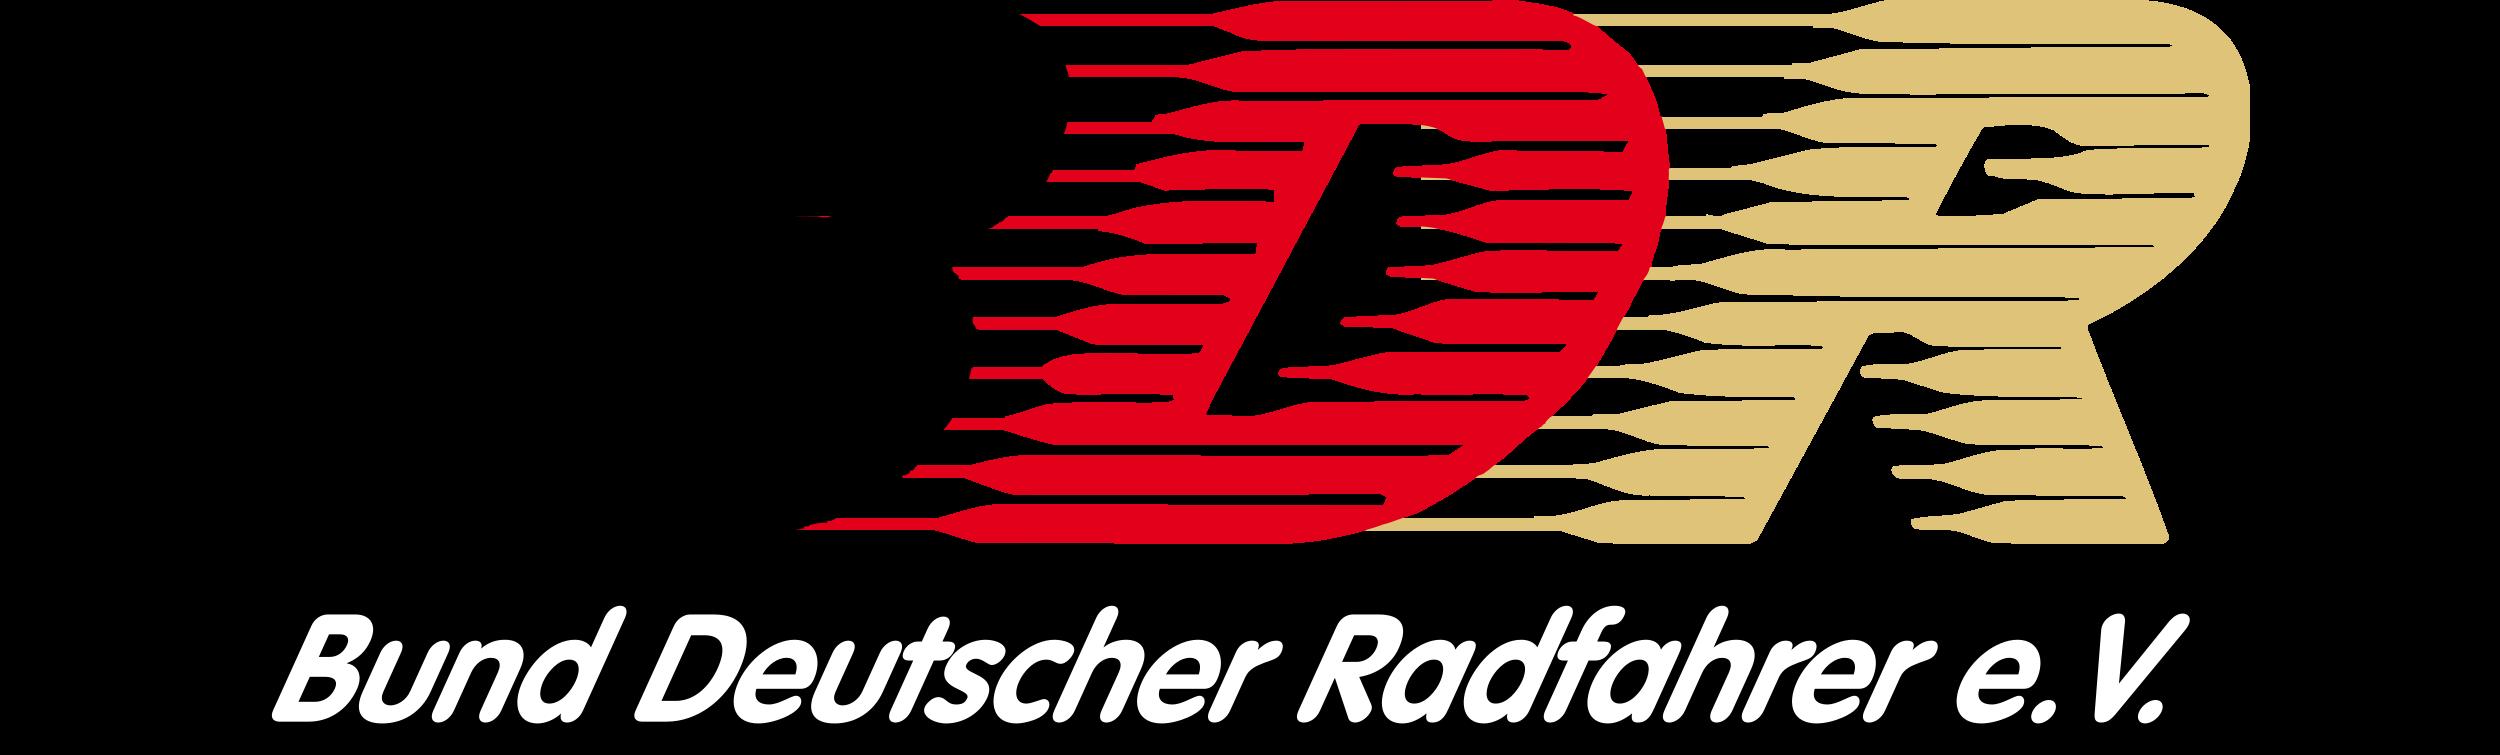 2500px-BDR_logo_755